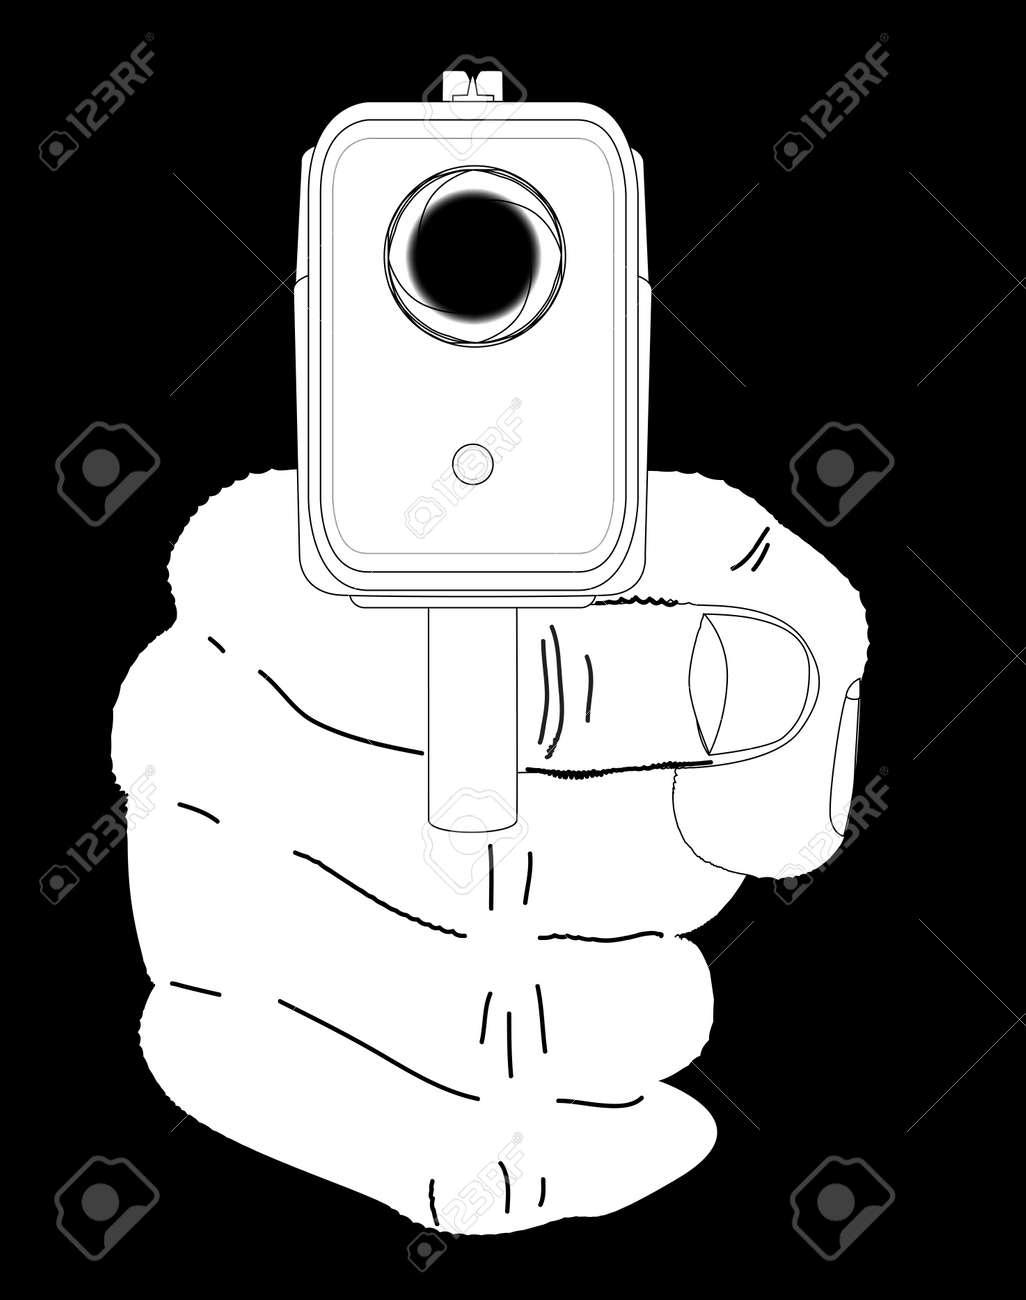 Looking down the barrel of a smoking hand gun